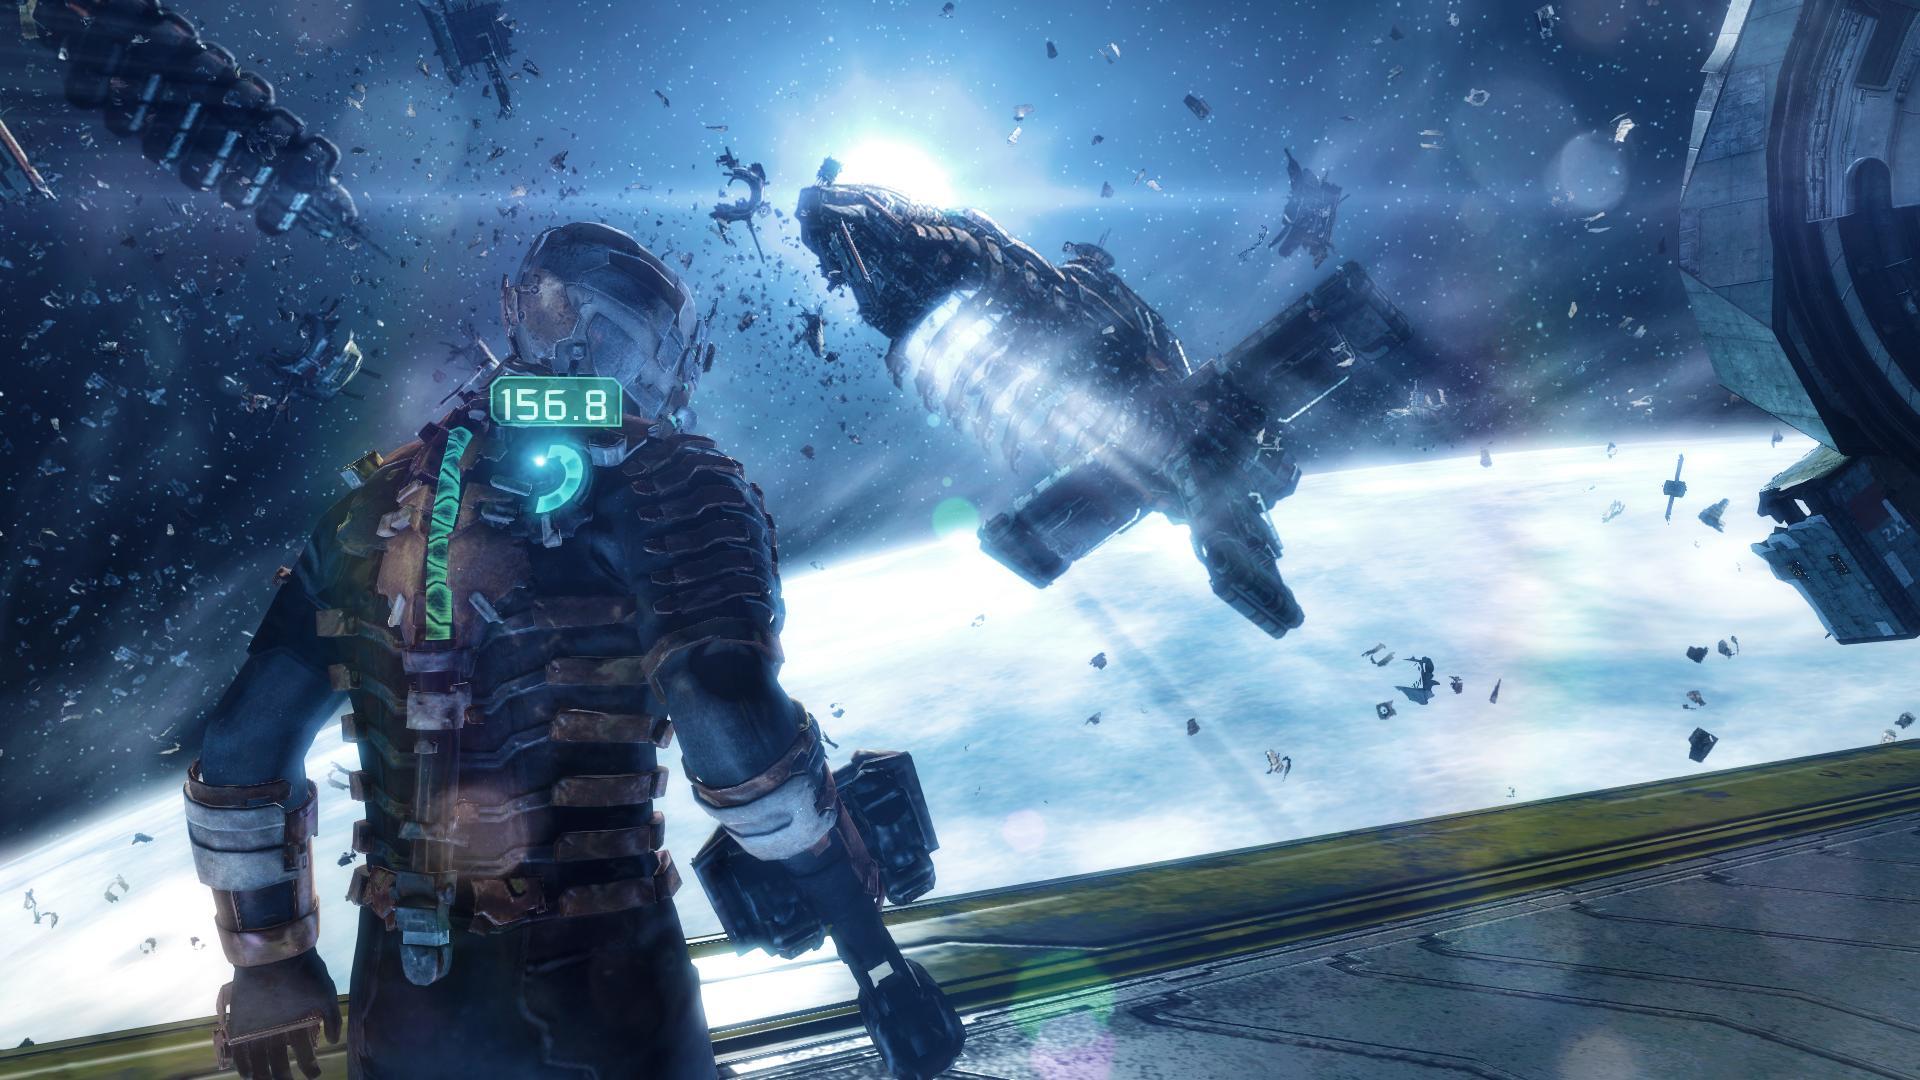 Former Visceral creative director reveals plans for Dead Space 4 | PC Gamer